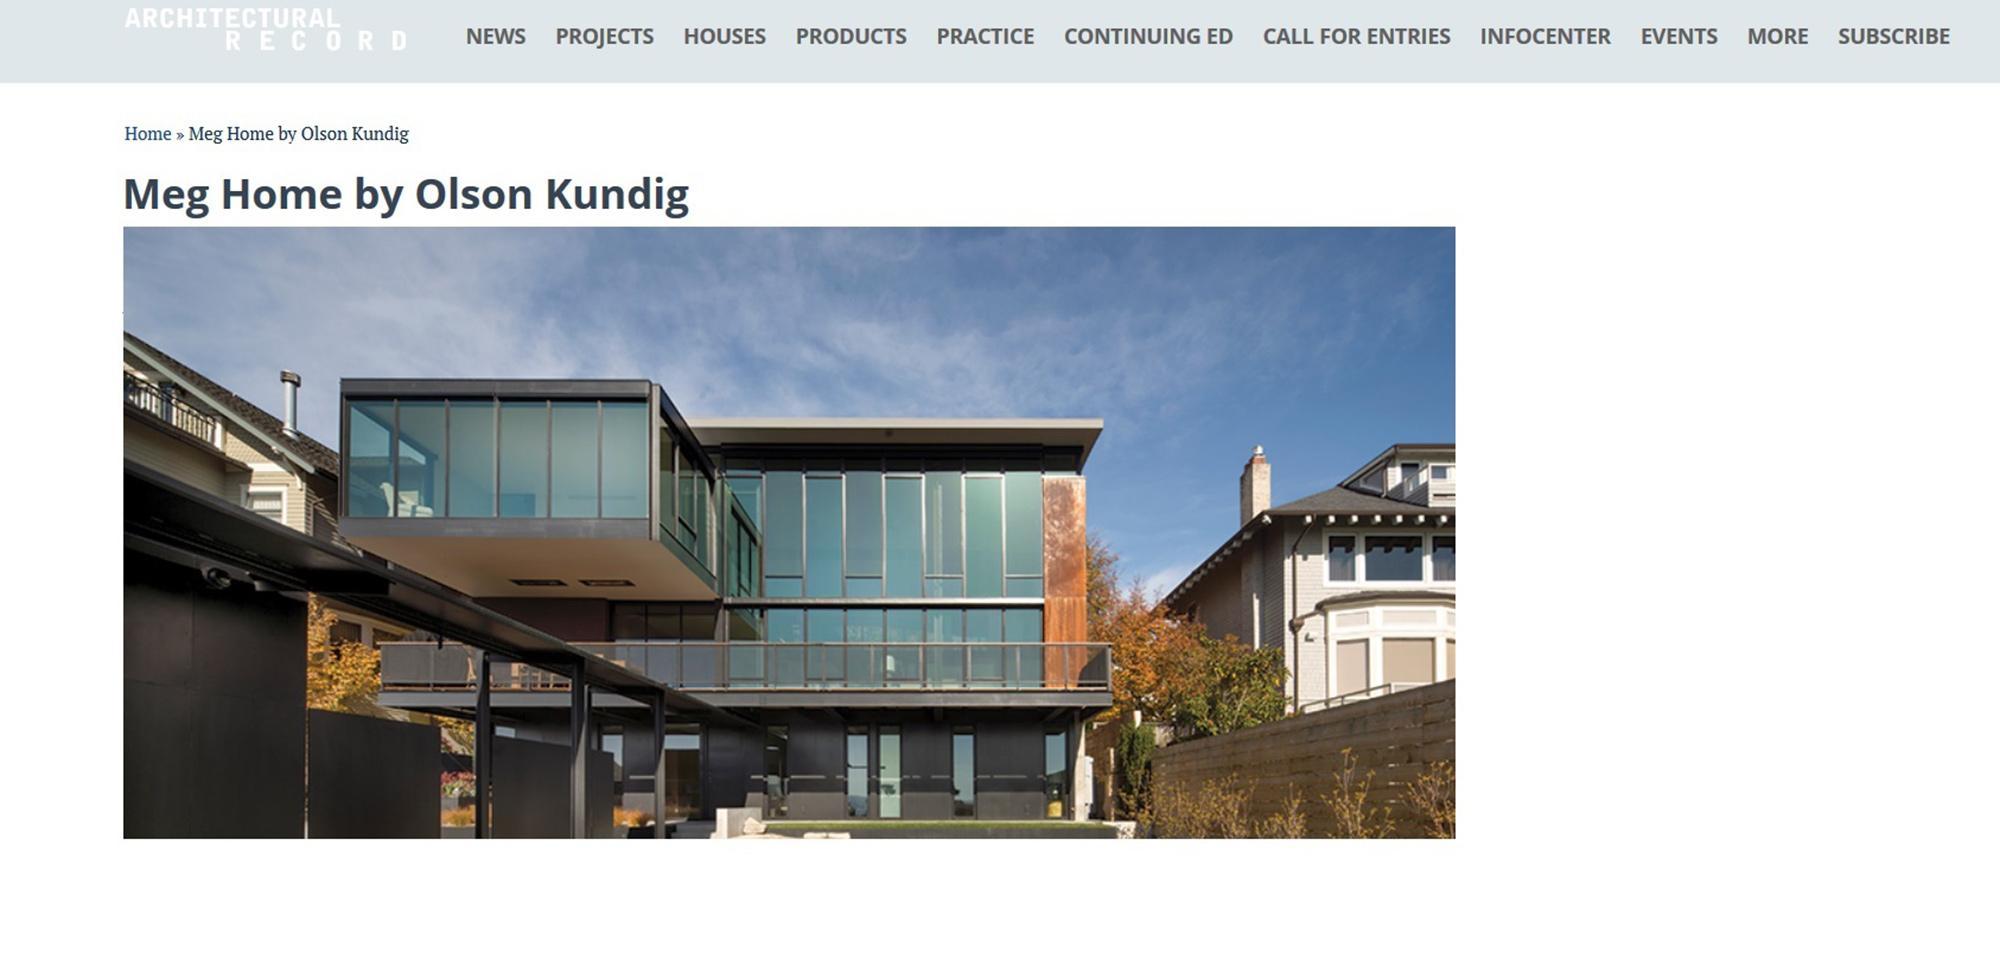 Meg Home in Architecture Record